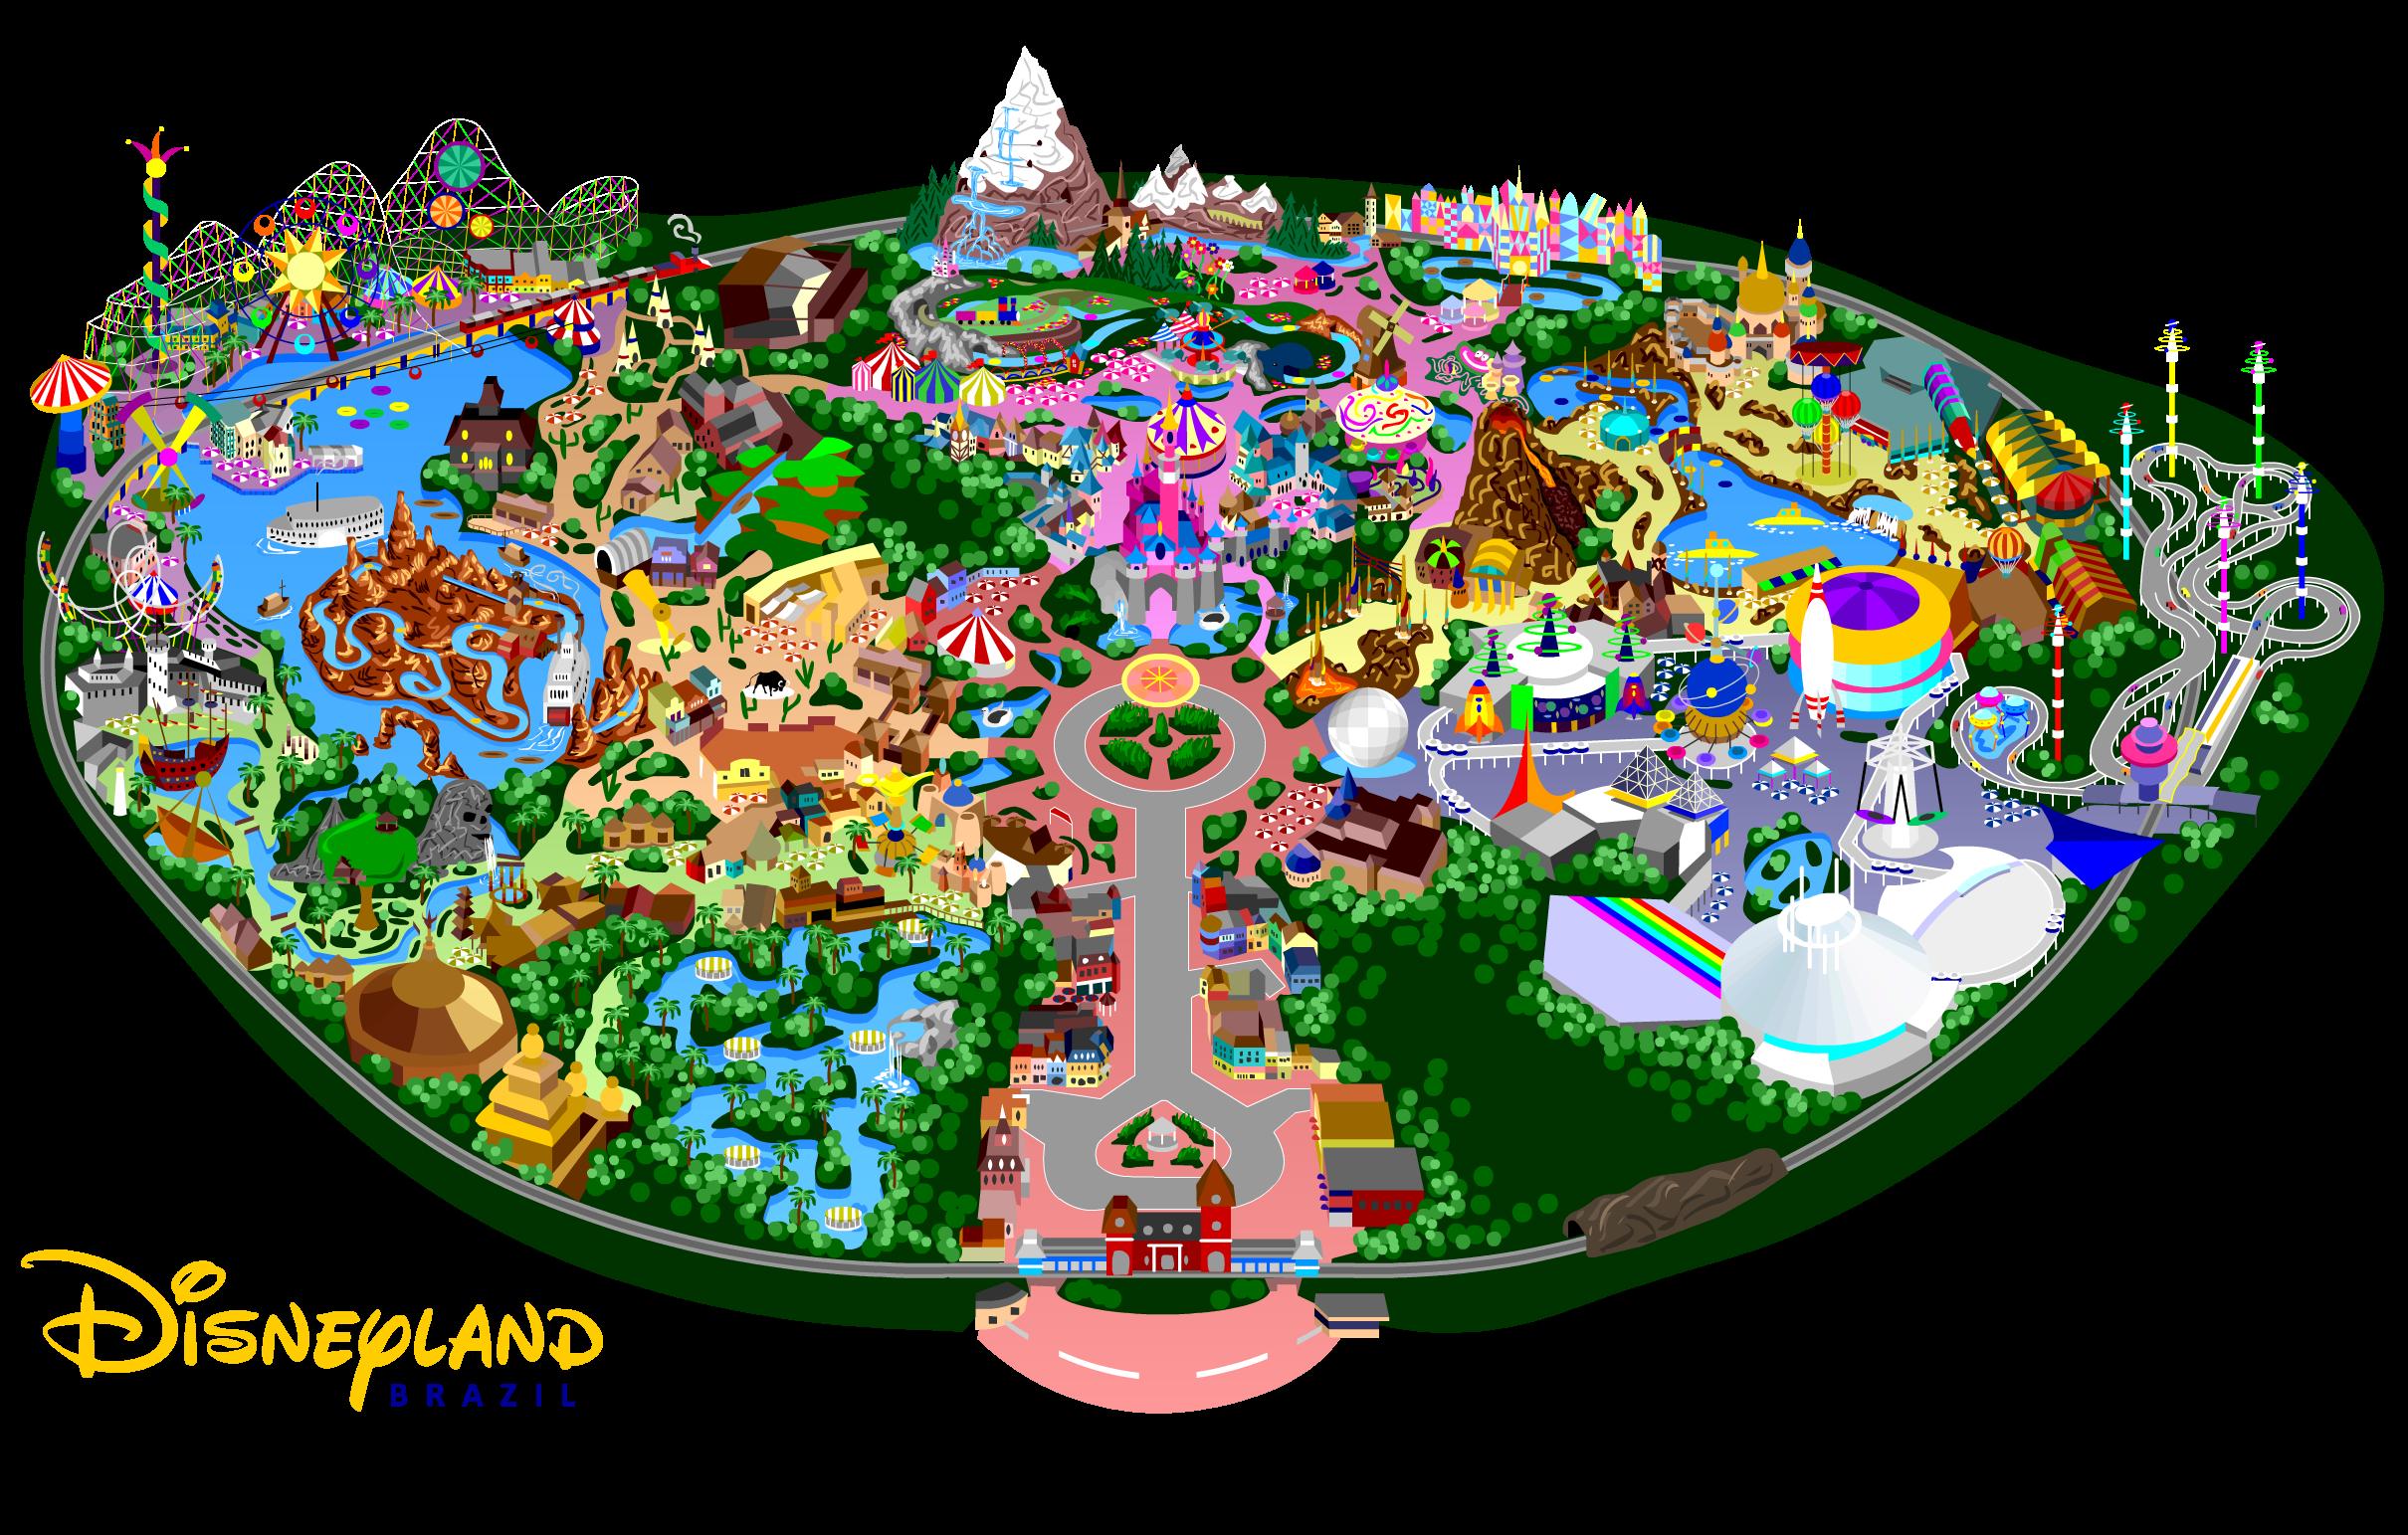 Disneyland By Mrzahta On DeviantArt - Disneyland brazil map